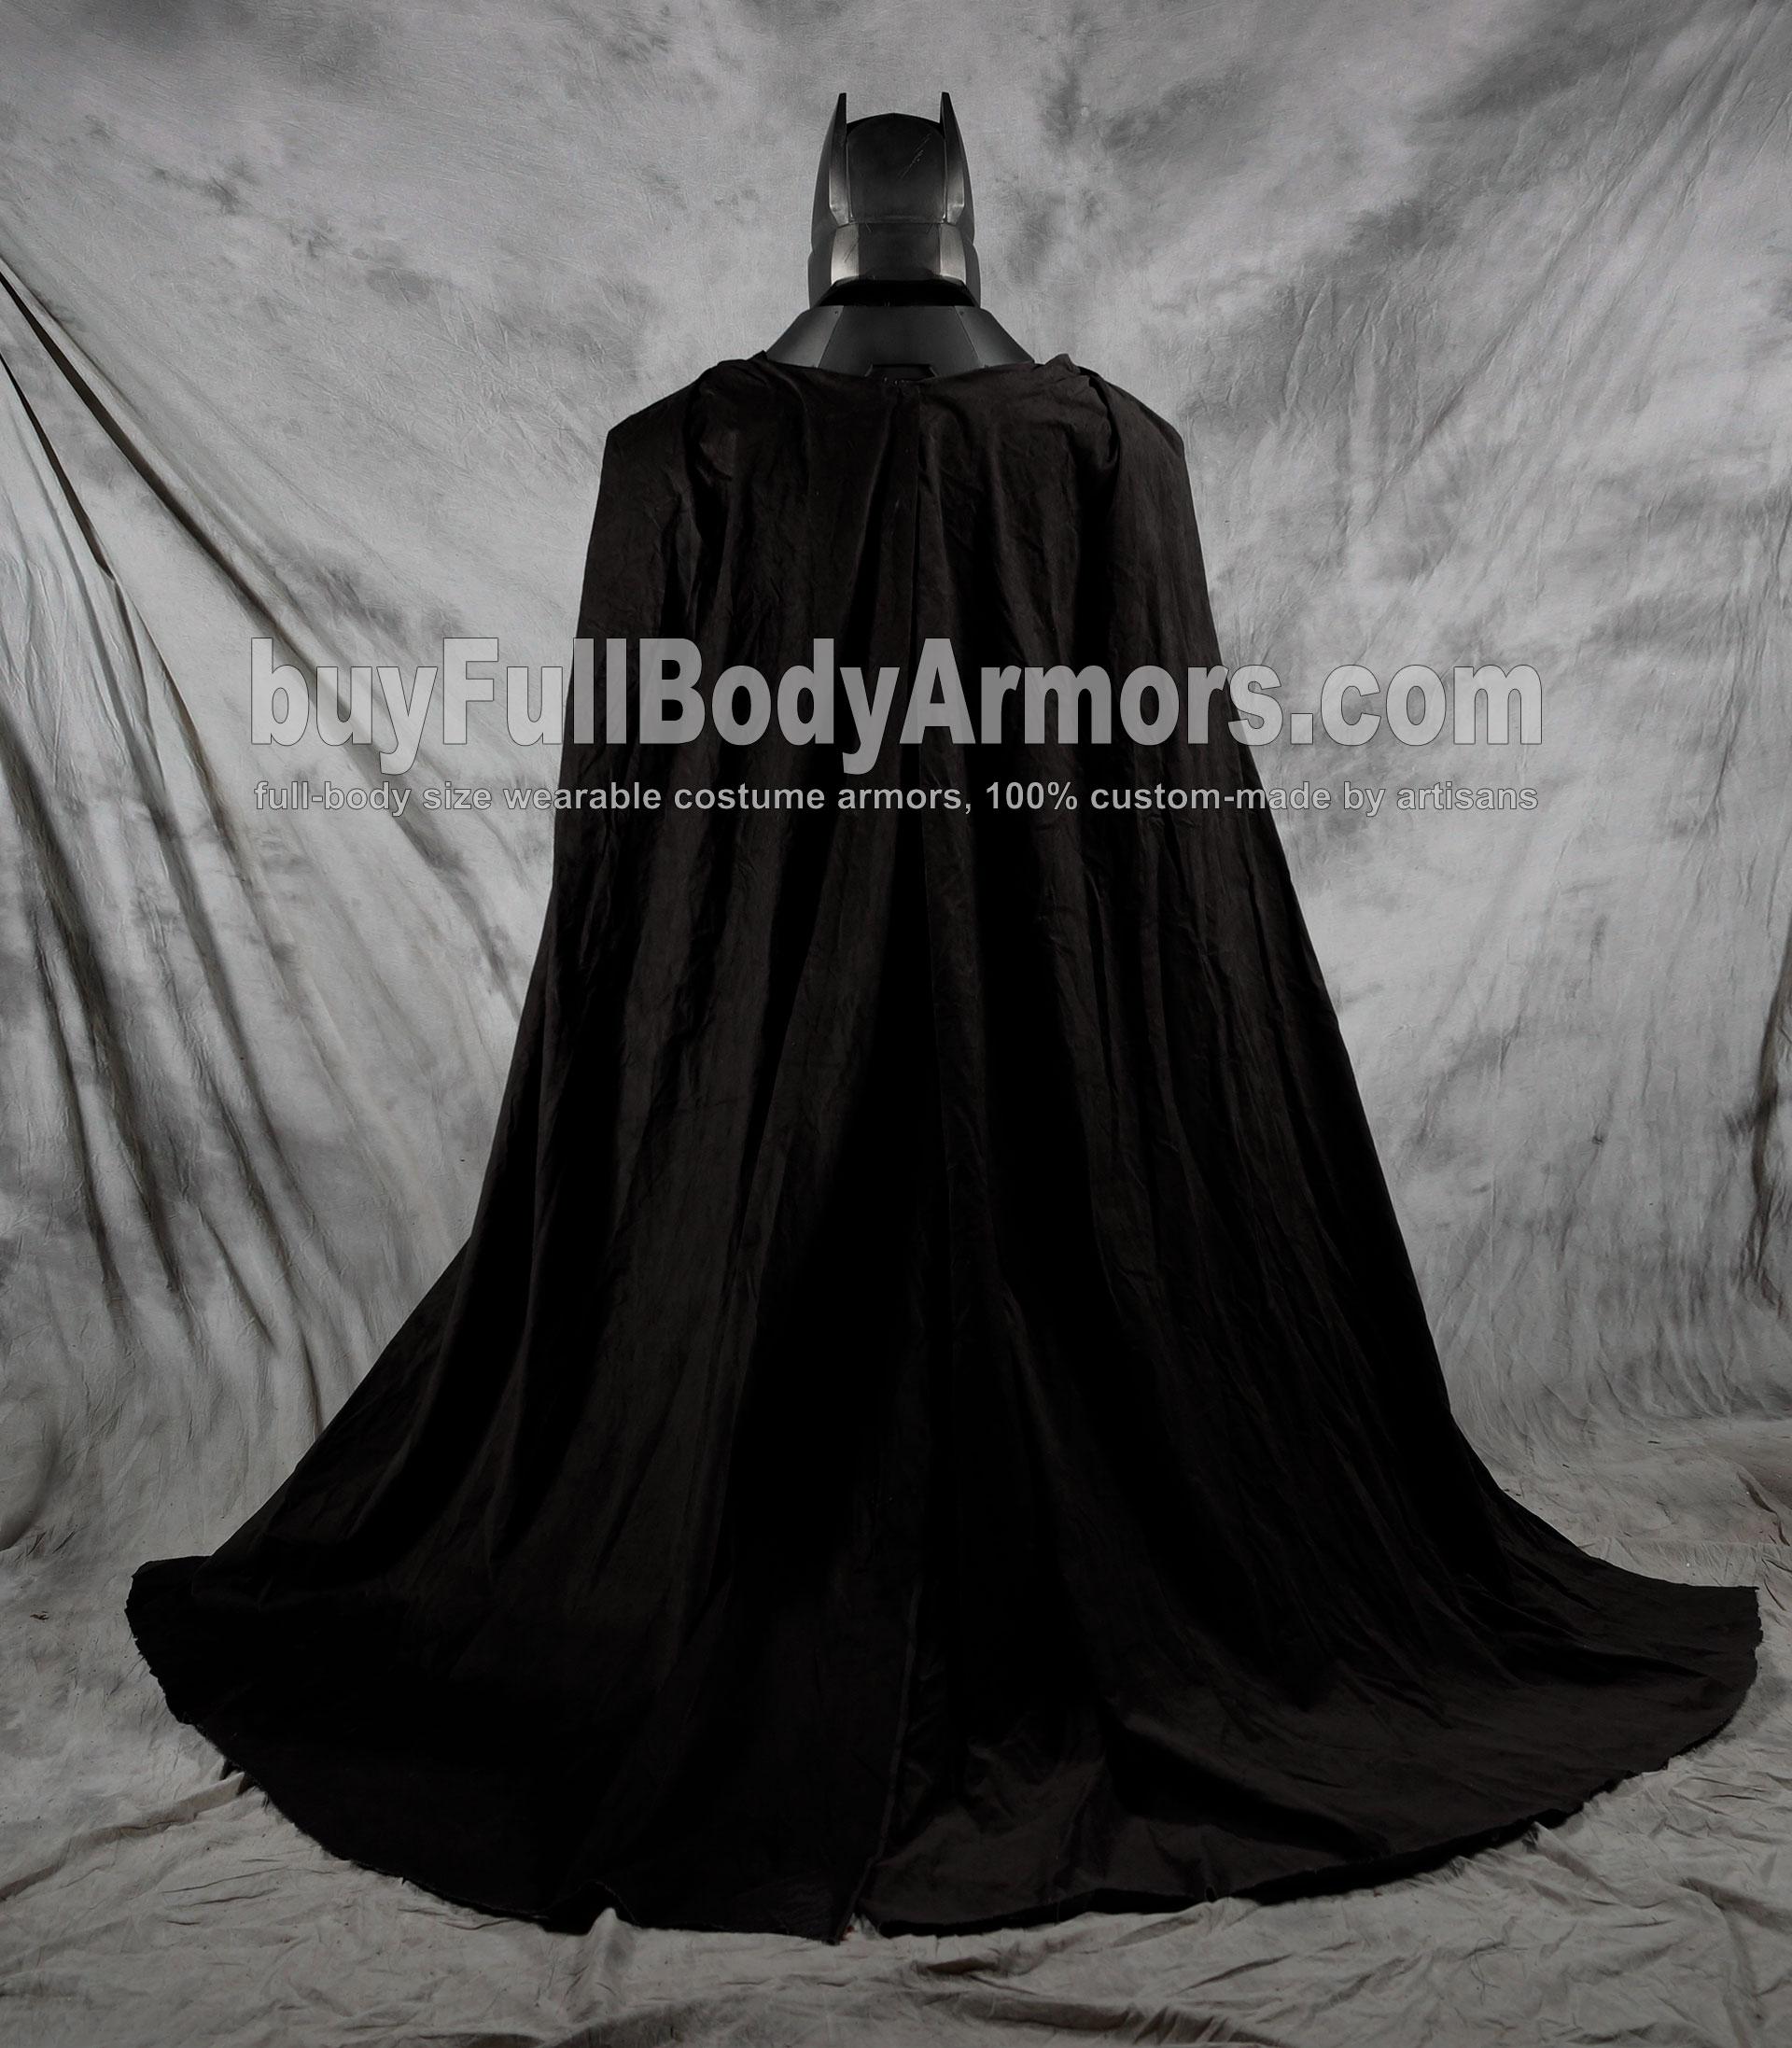 The Wearable Armored Batsuit (Batman armor suit costume) back